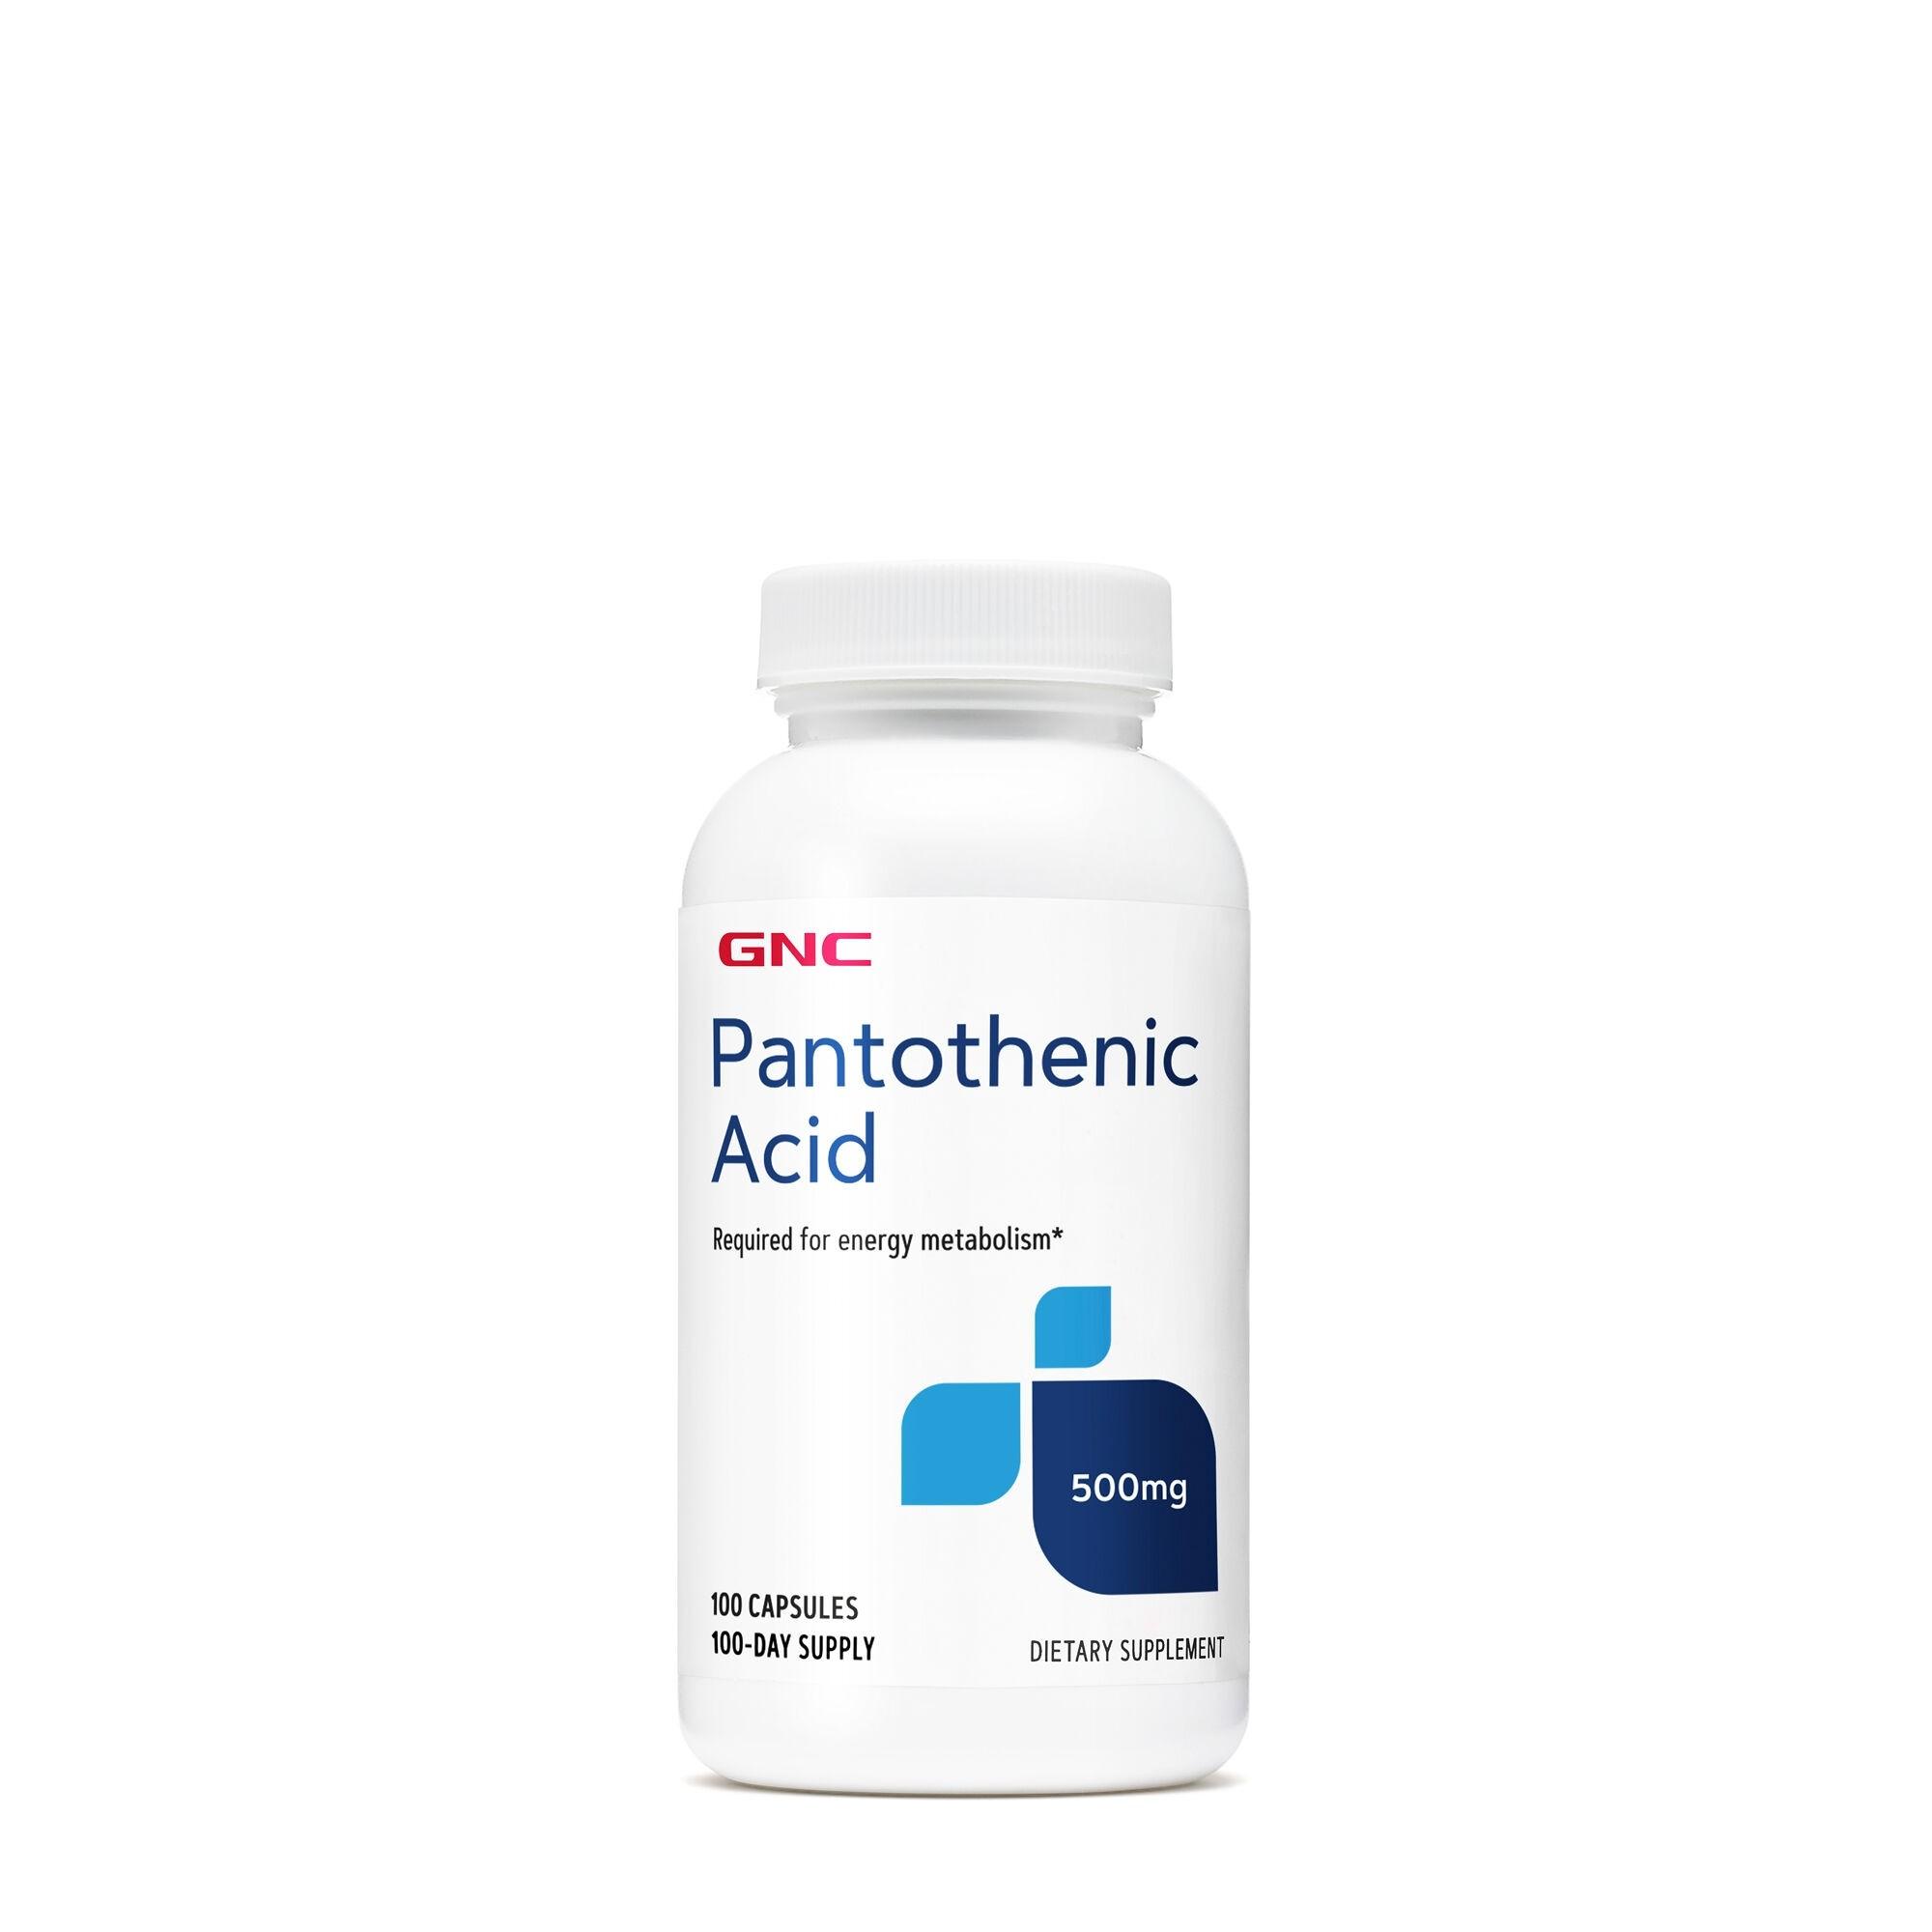 GNC Pantothenic Acid 500 mg, Acid Pantotenic, 100 cps